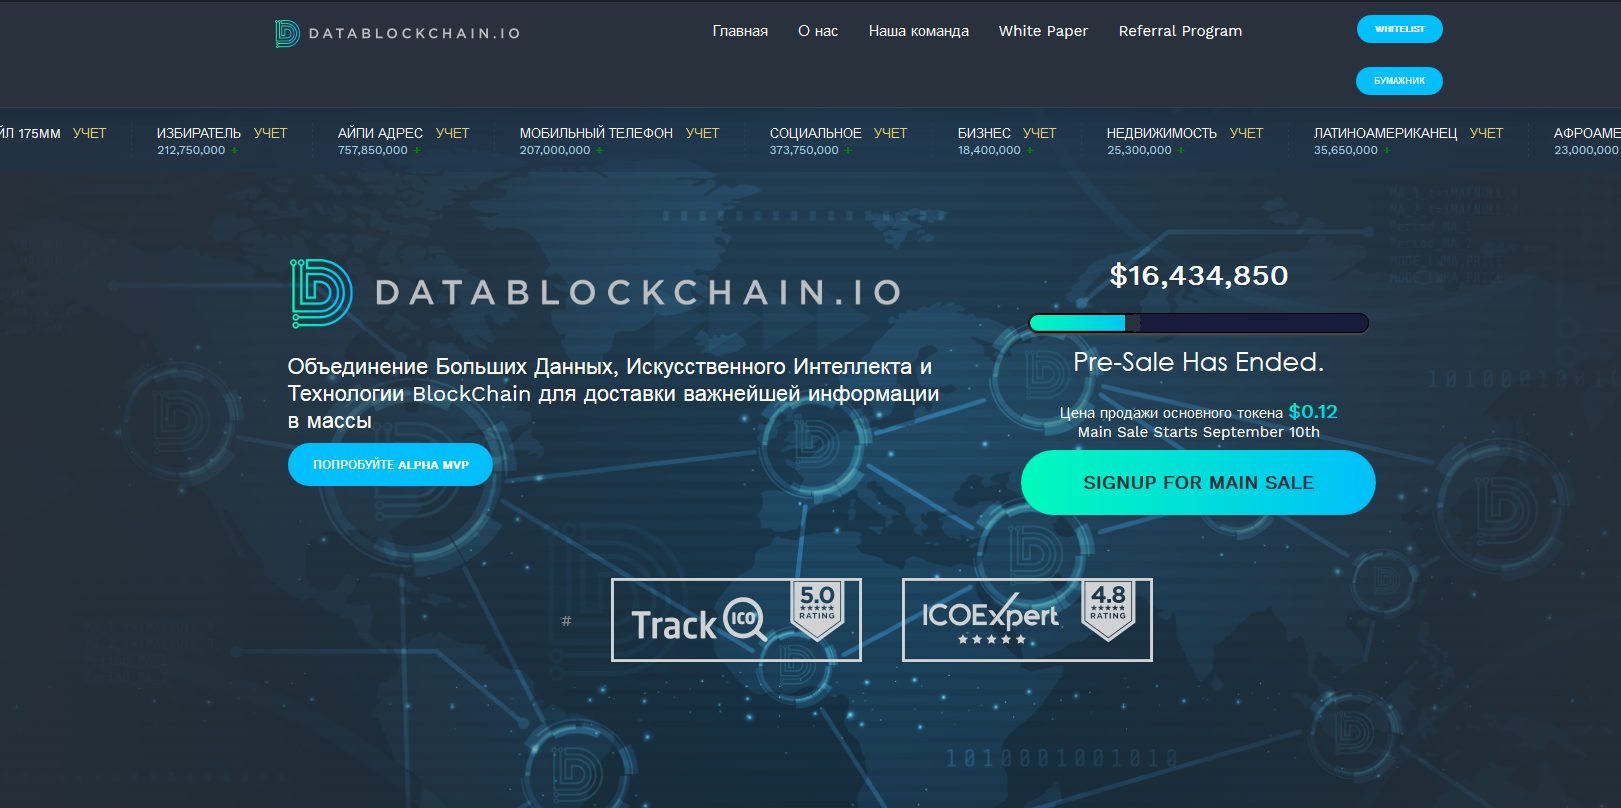 Screenshot_2018-07-05 Data Blockchain ICO bench, DBC ICO, DBCC Coins DataBlockChain io.png